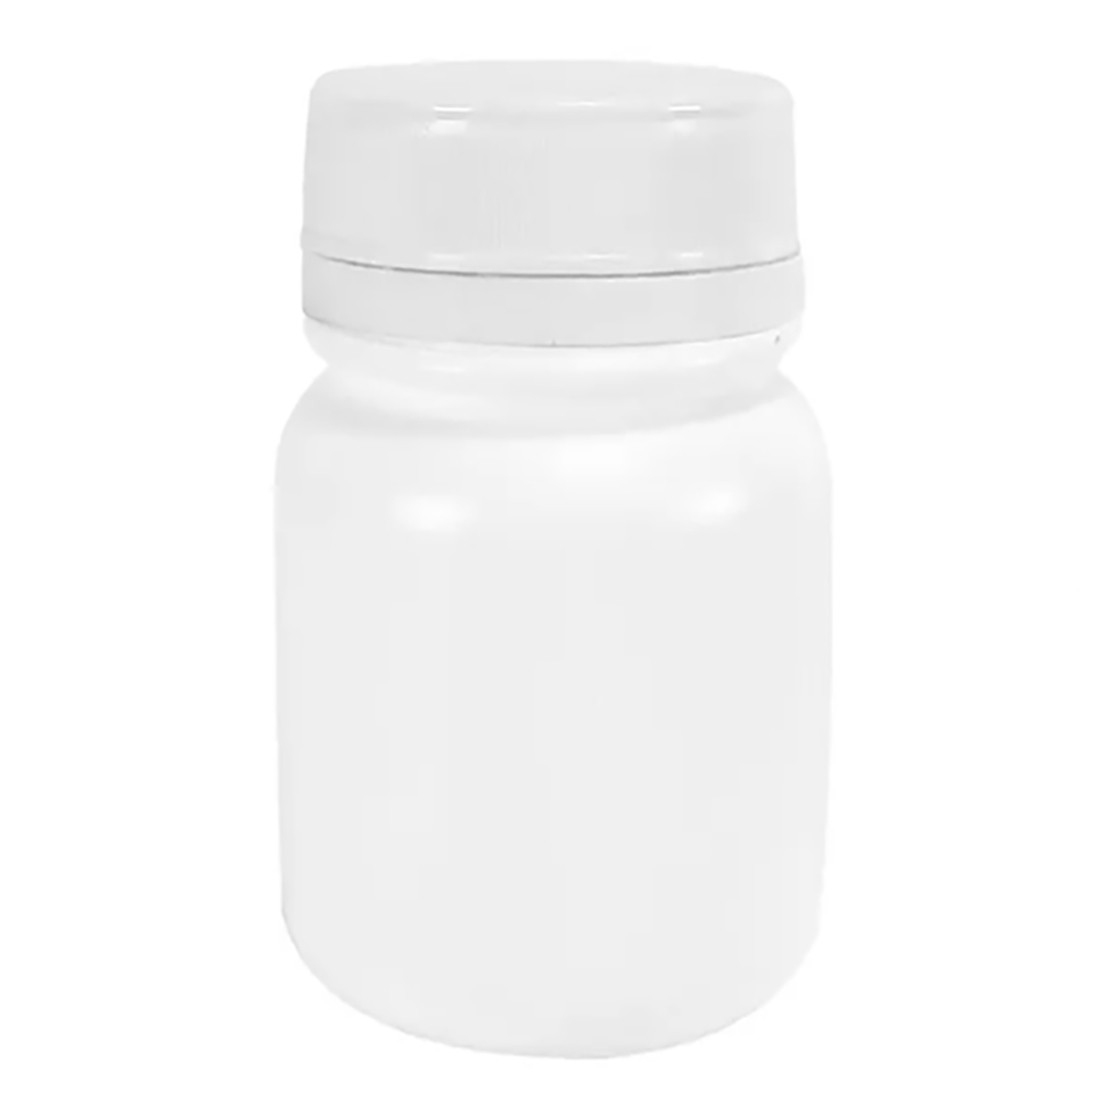 Pote Plástico para cápsula 120 ml Rosca Lacre kit com 150 unid